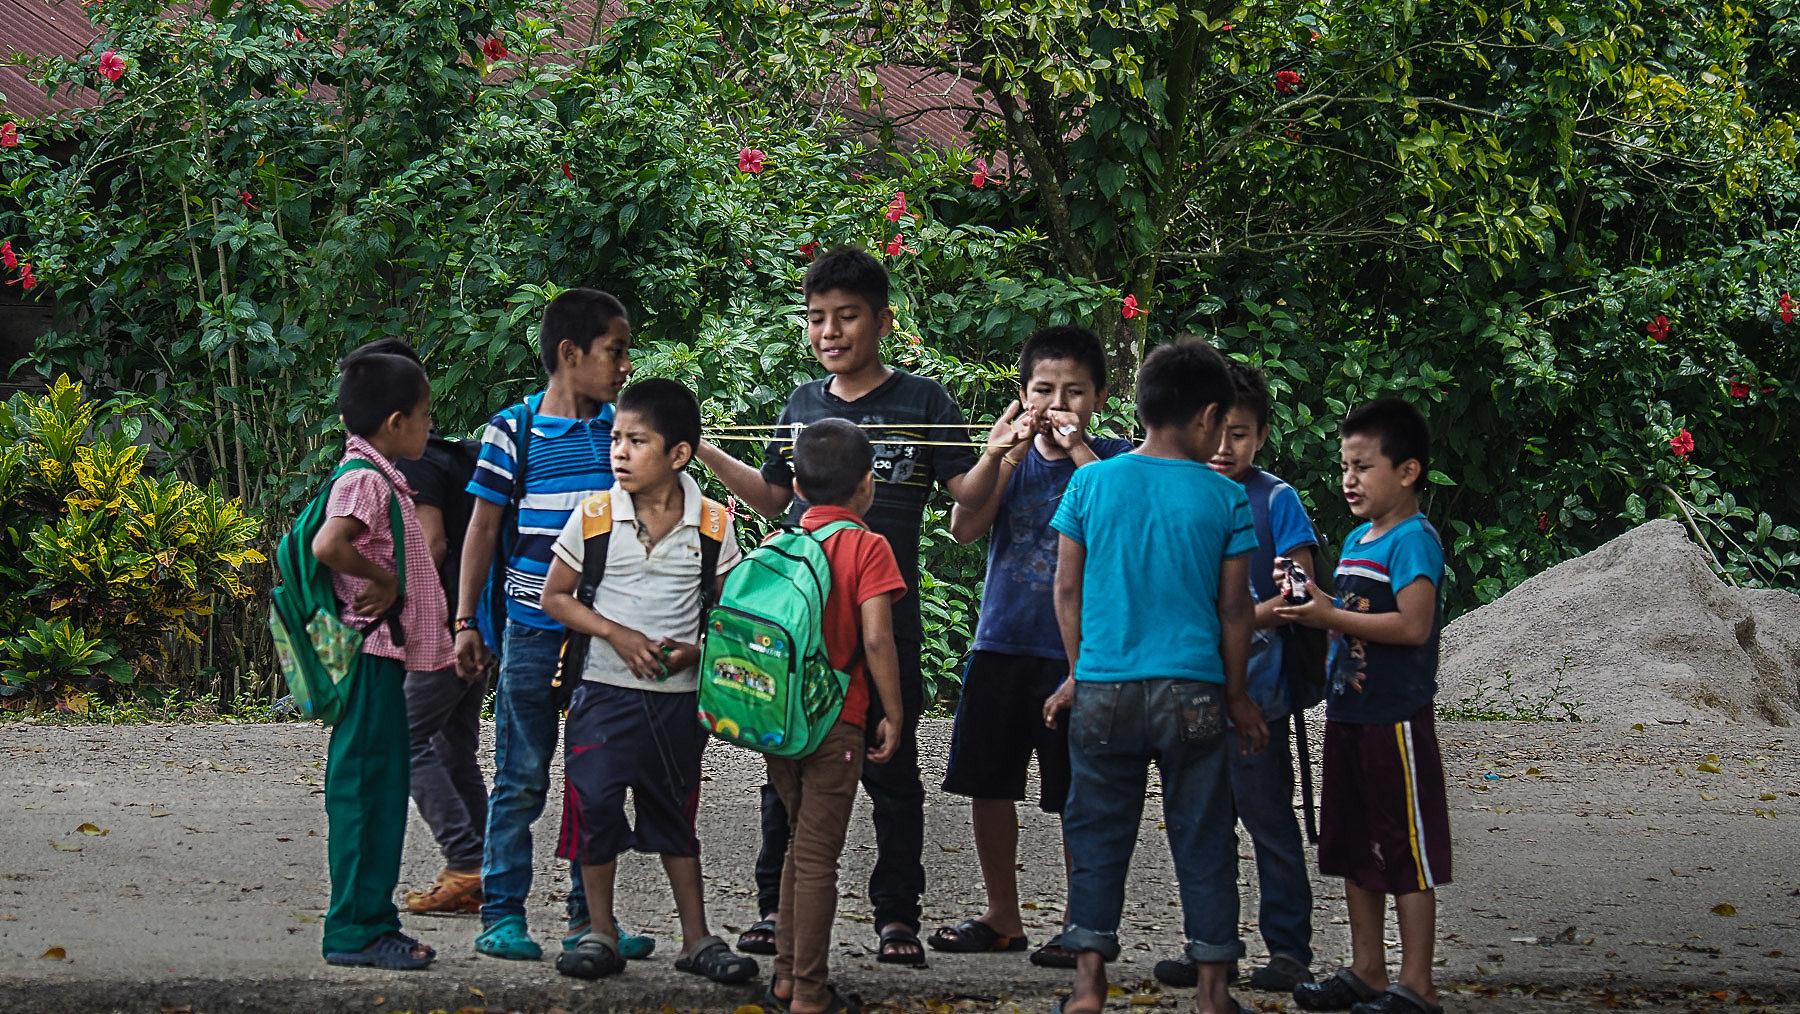 Spielende Kinder in Chiapas